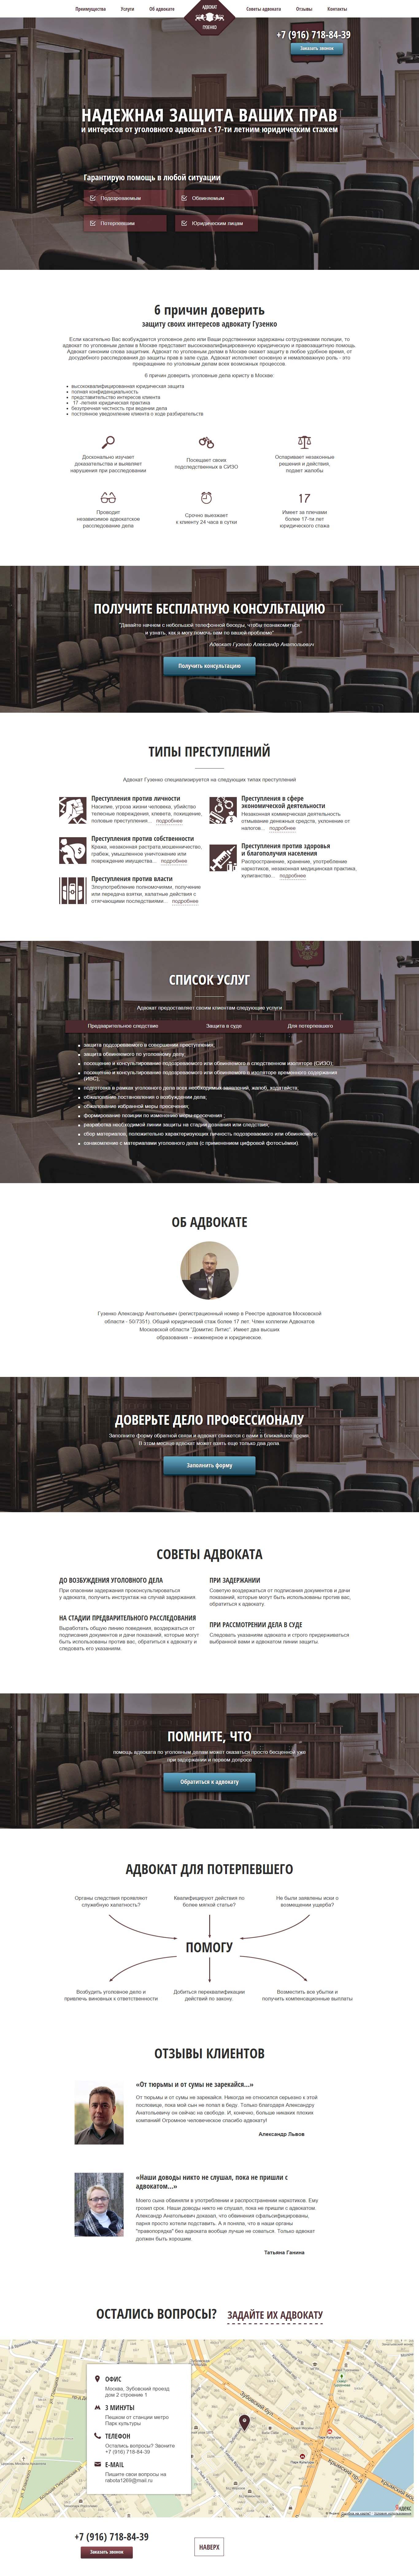 Landing Page - Адвокат